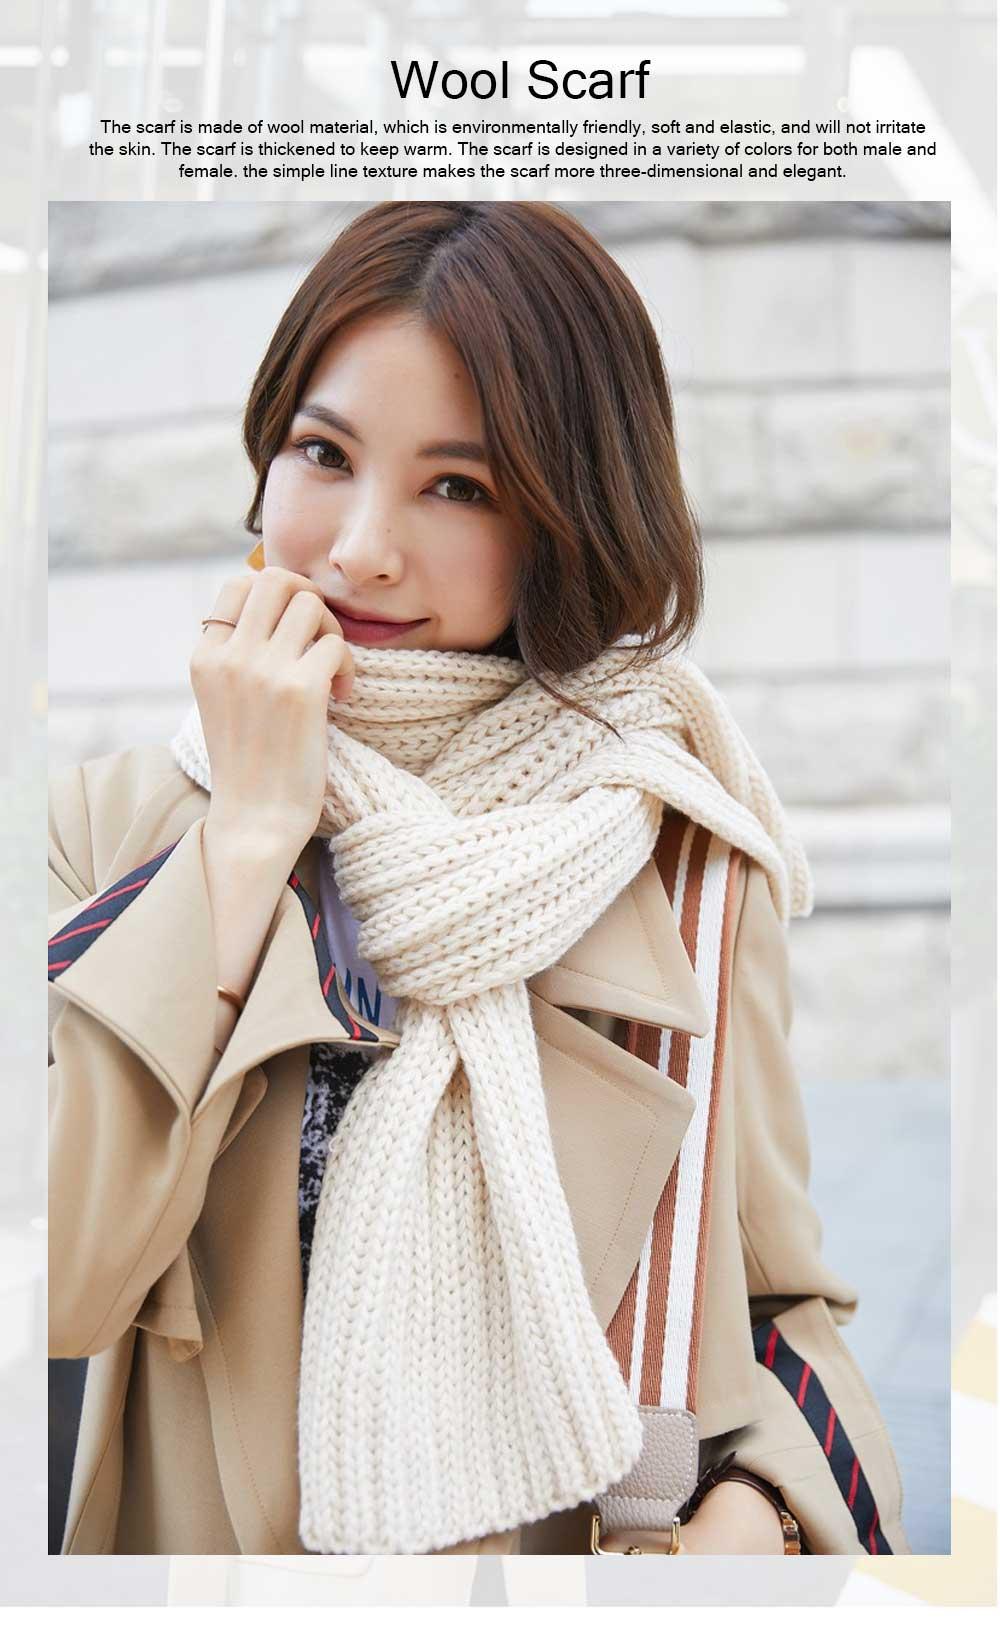 New Wool Scarf Soft Tippet Longitudinal Knitting for Women Men Keep Warm Skin-friendly Muffler Winter 0